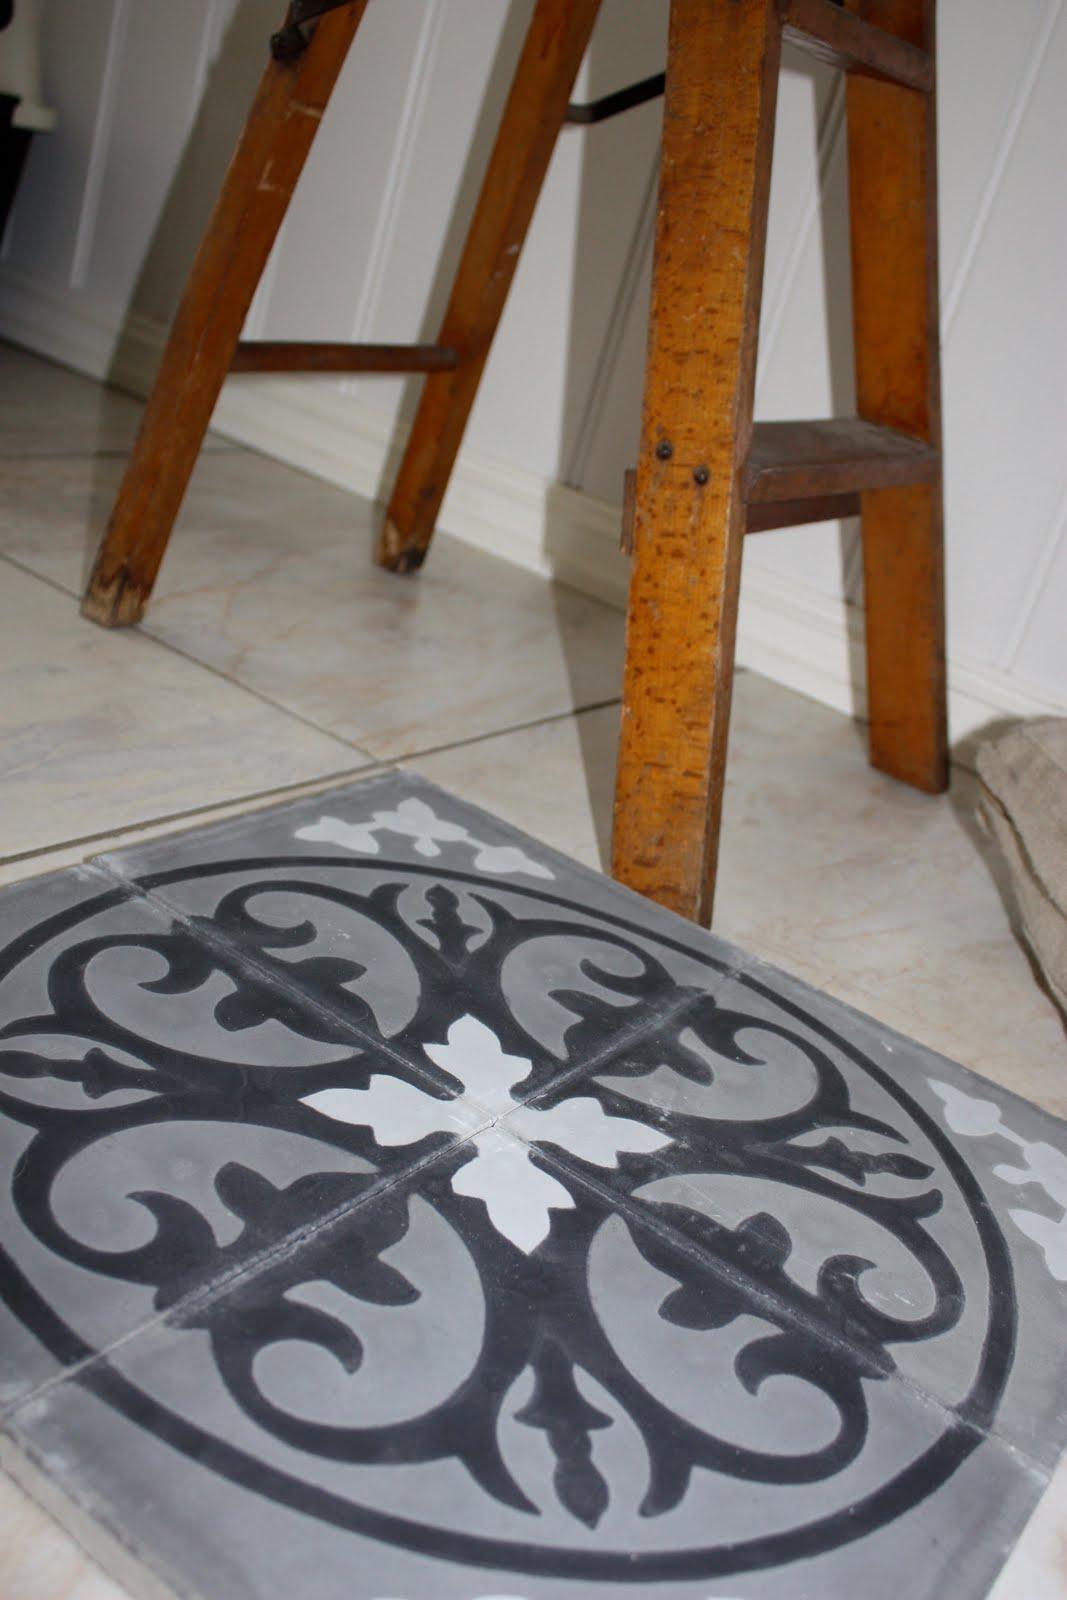 Tone nygaard: sorte eller hvite gulv?